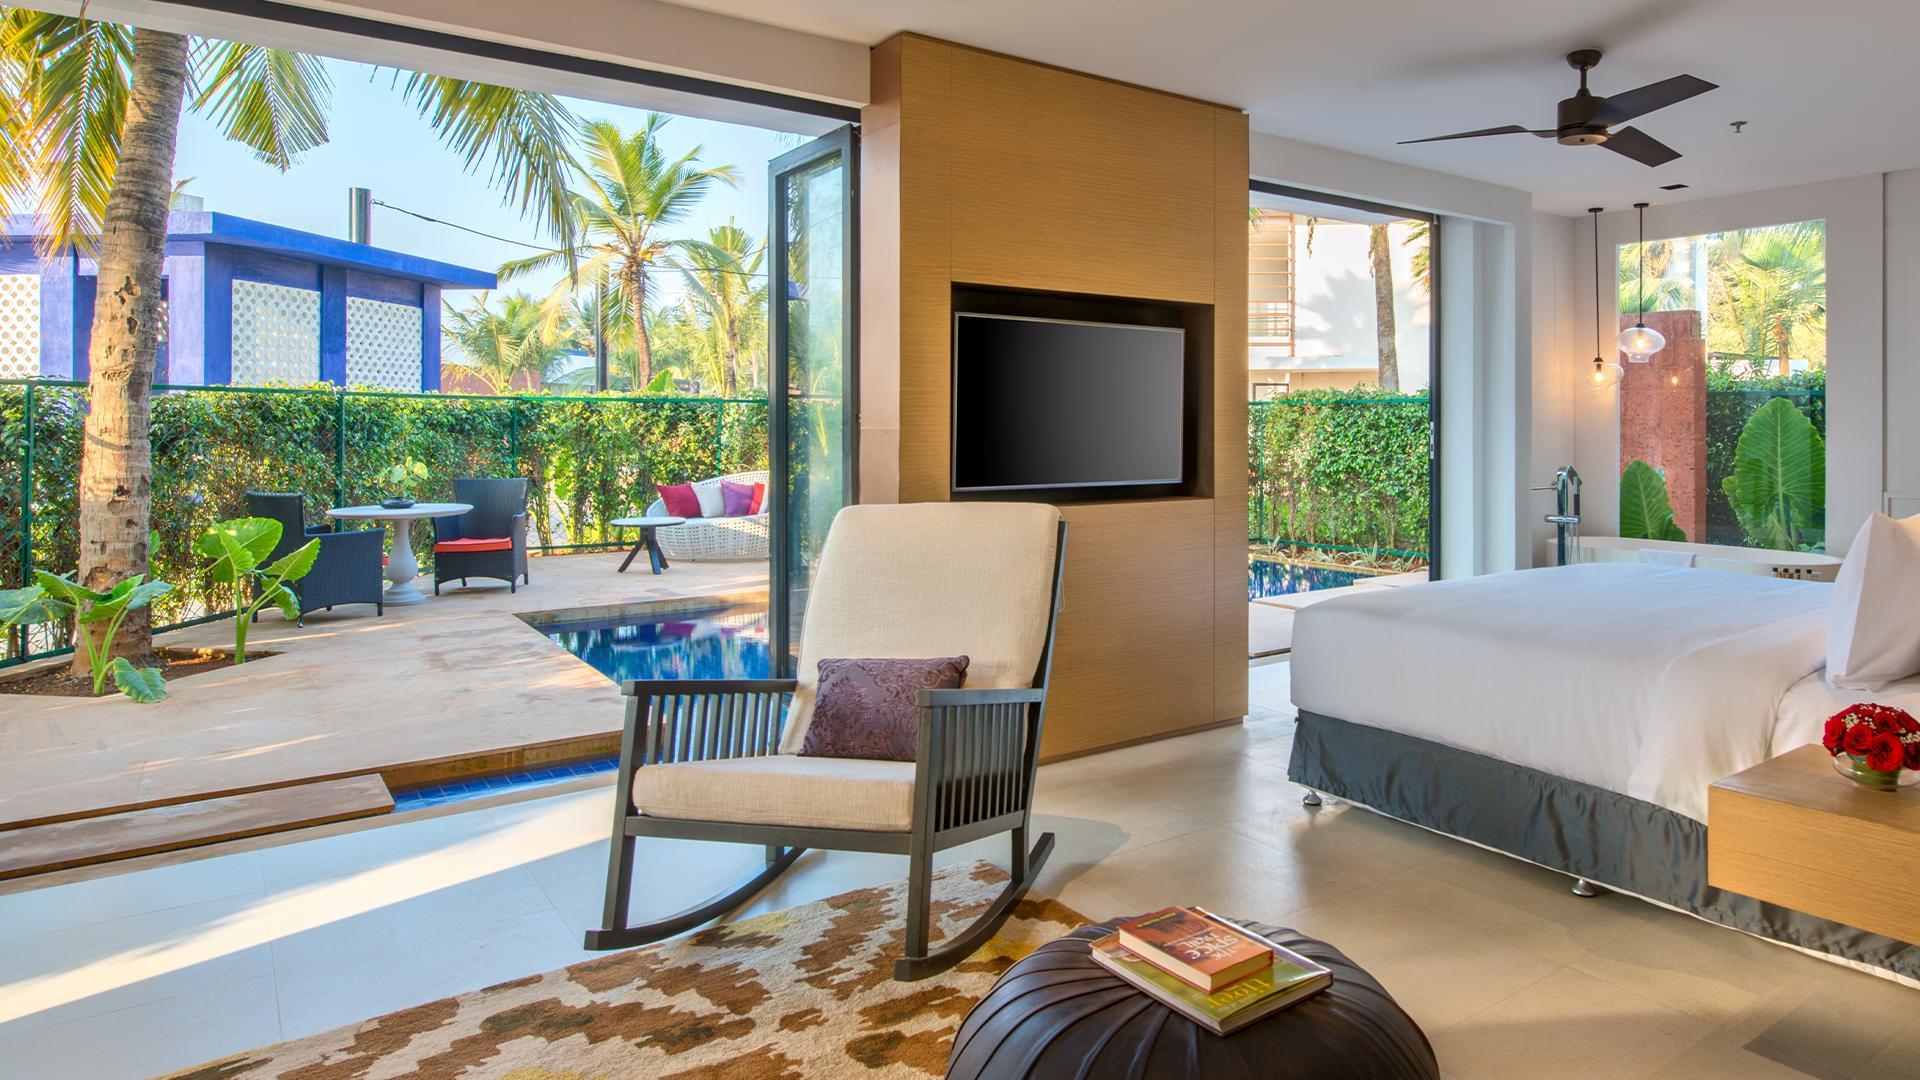 Essence Plunge Pool Room image 1 at Azaya Beach Resort by South Goa, Goa, India